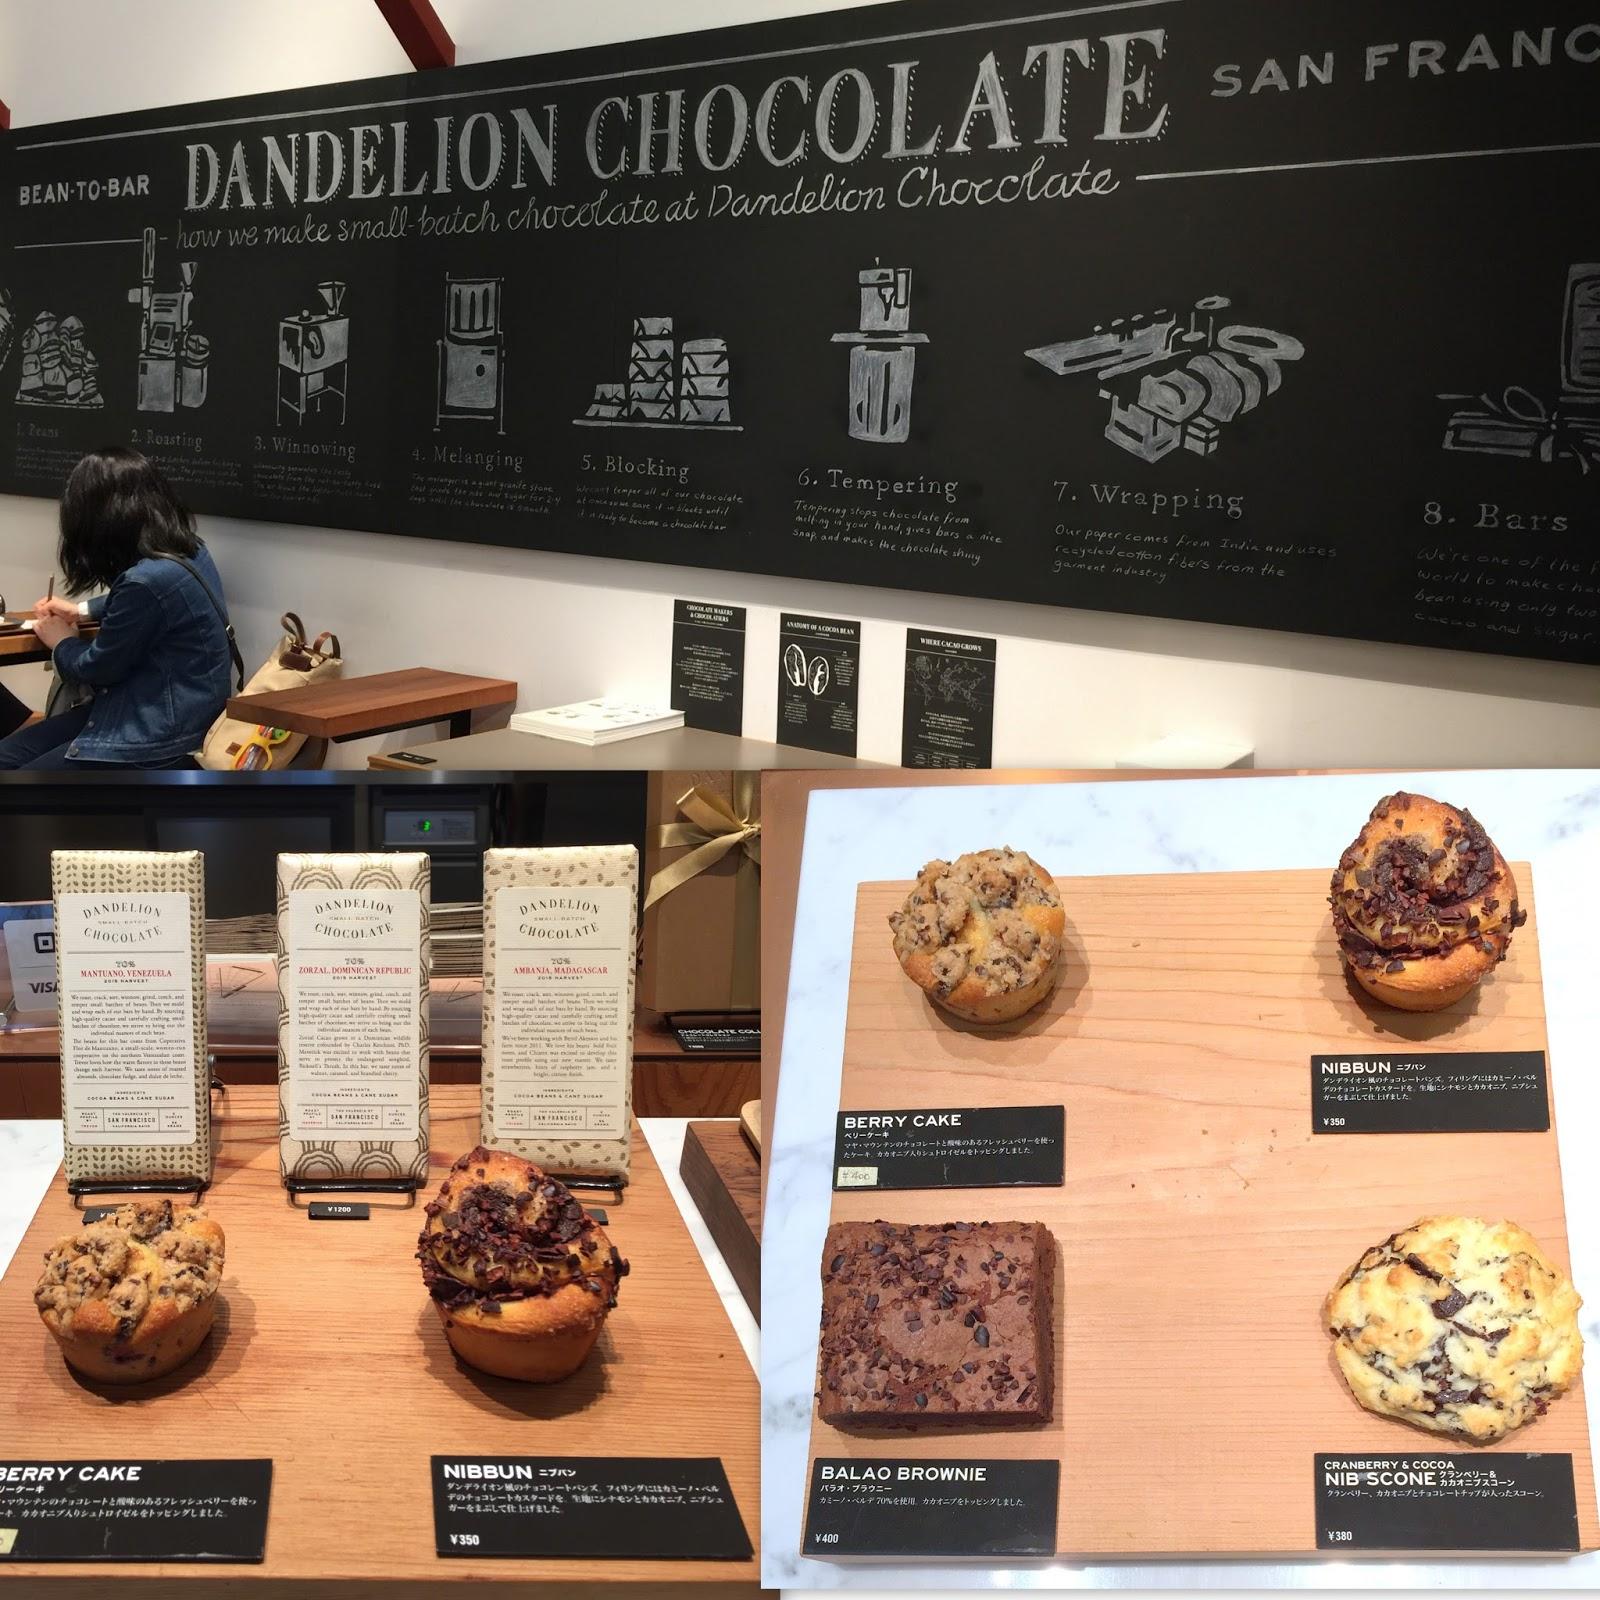 Singapore Japan Food Blog : Dairy and Cream: Dandelion Chocolate ...